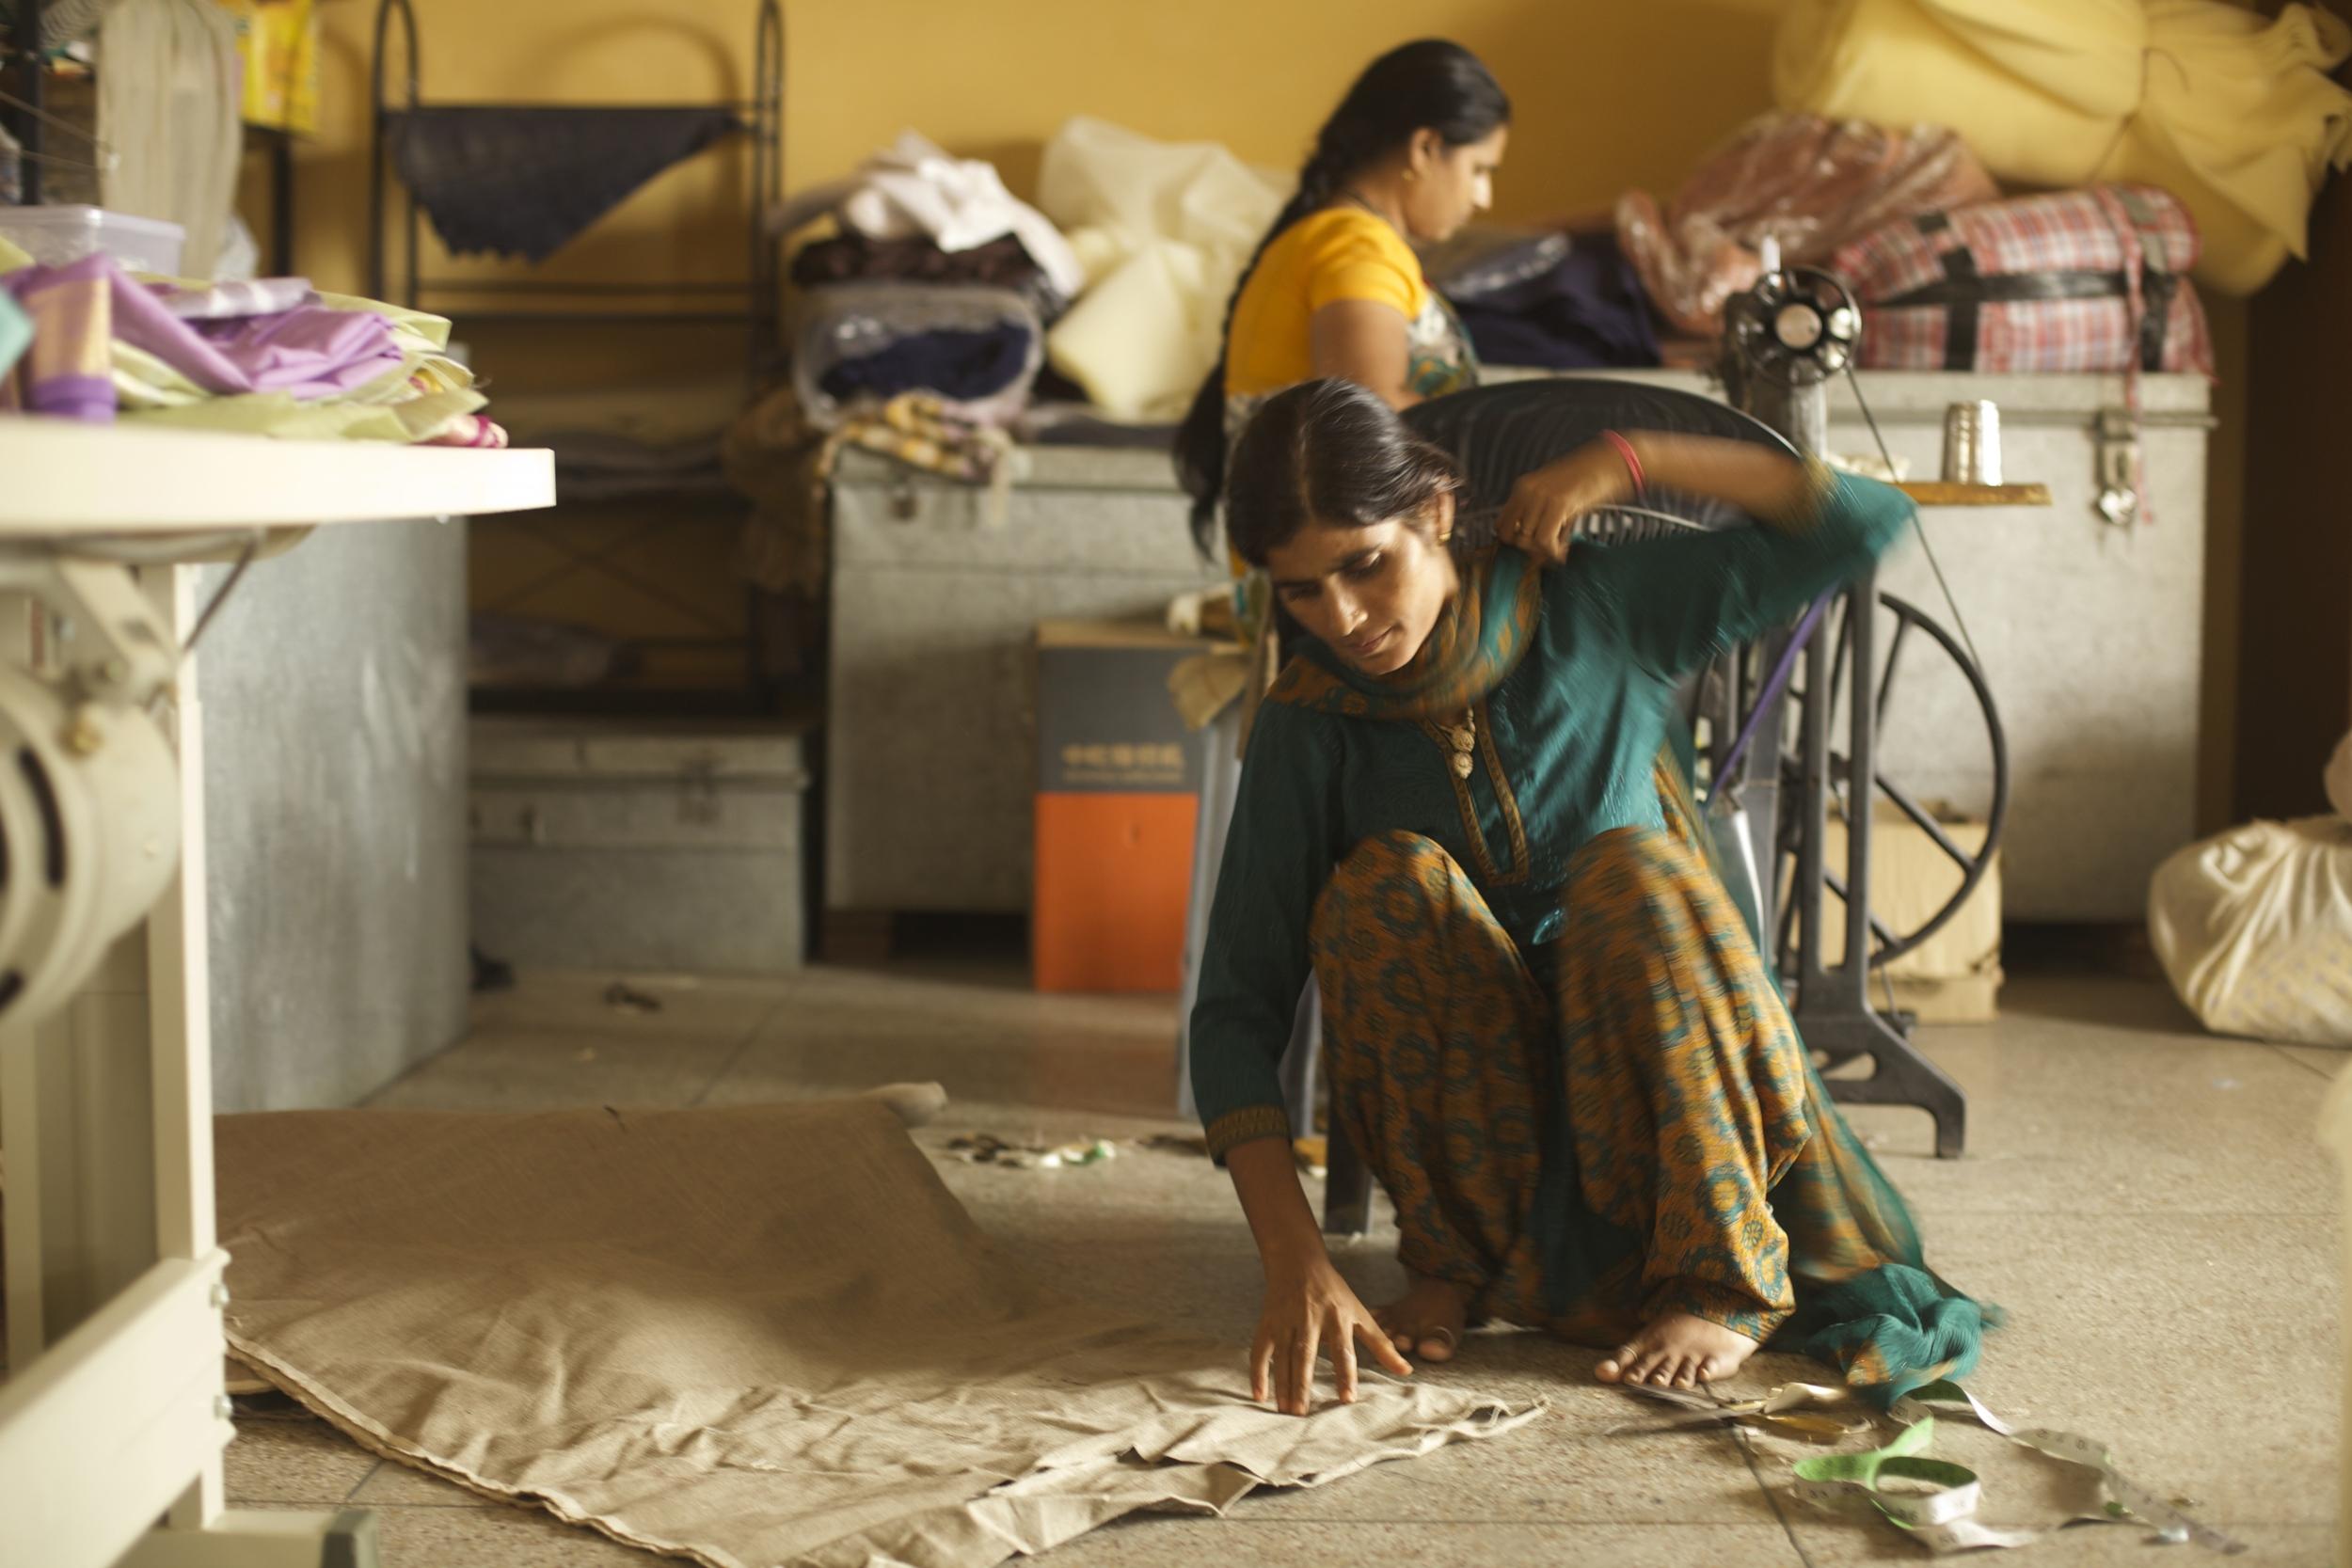 Mamta andNeetu in the makings of a bag.